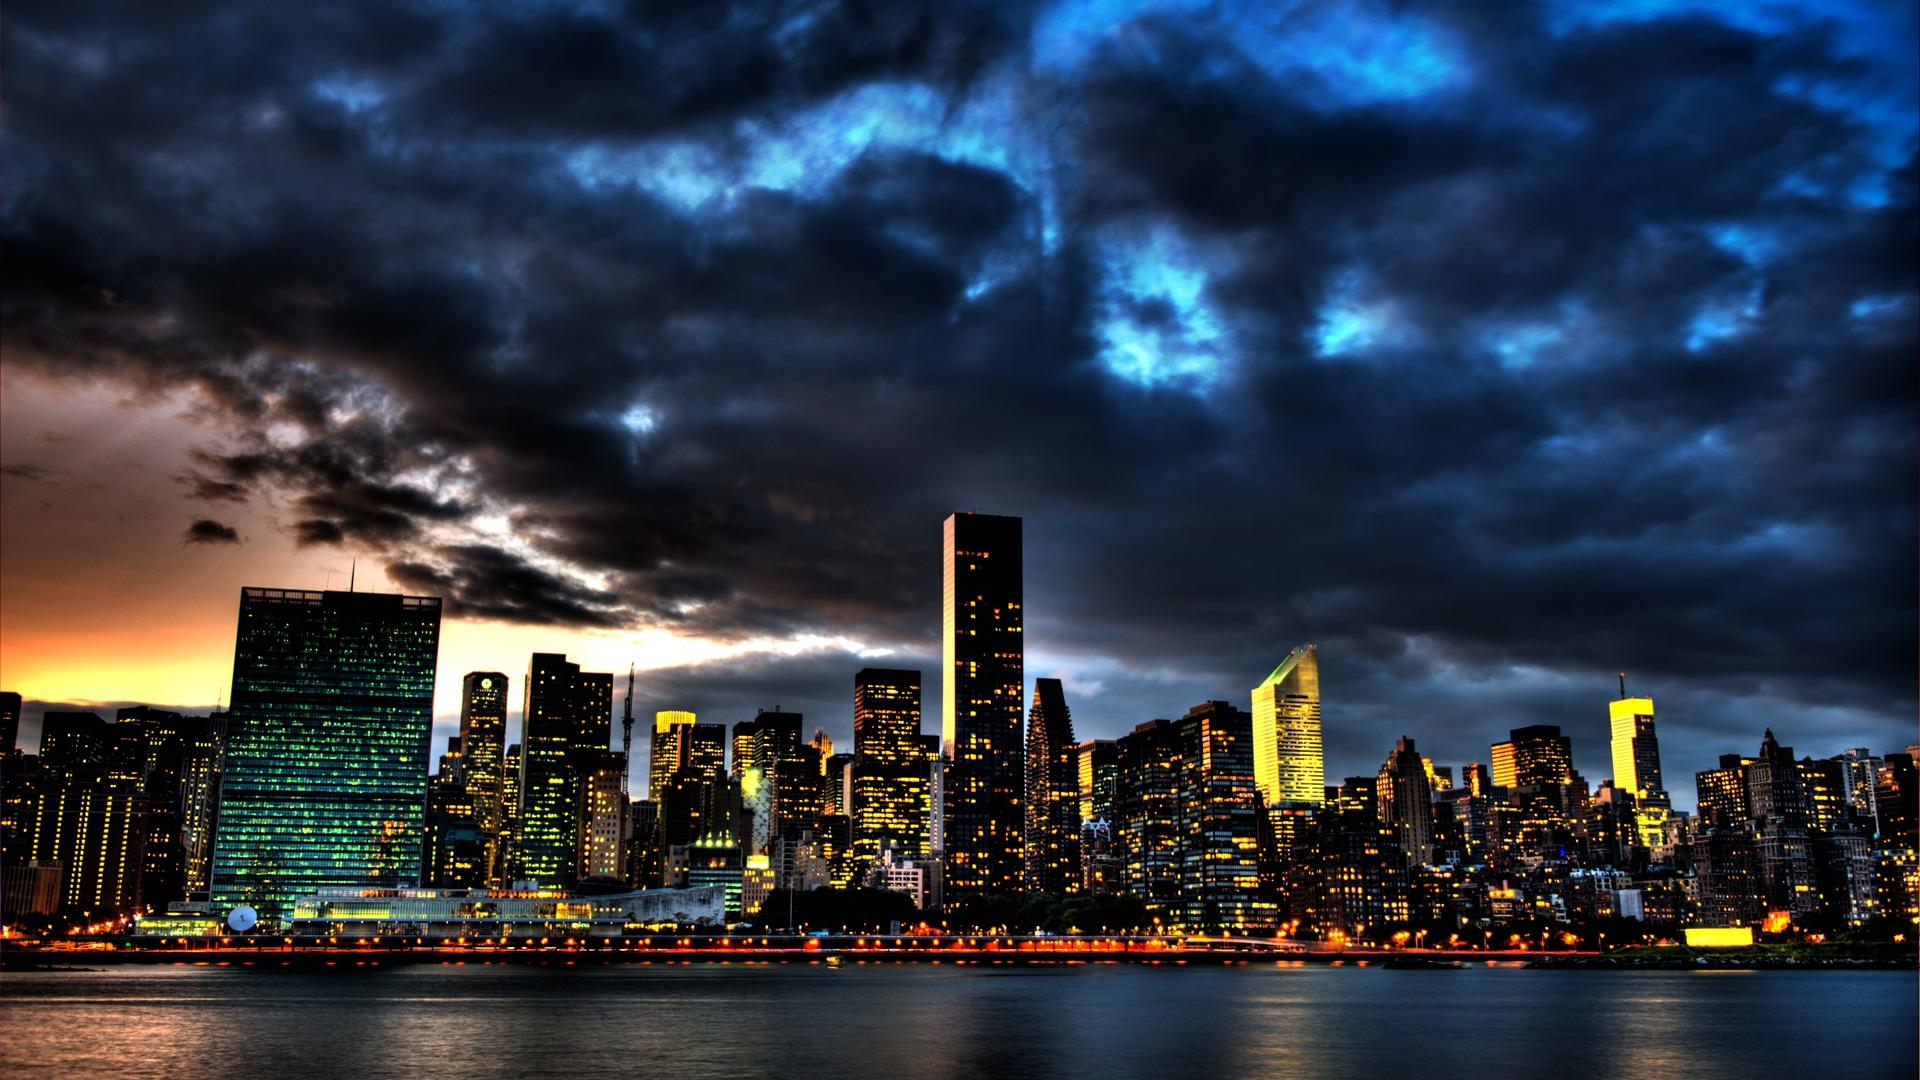 New York City Skyline 1080p Wallpaper City HD Wallpapers Wide Screen 1920x1080